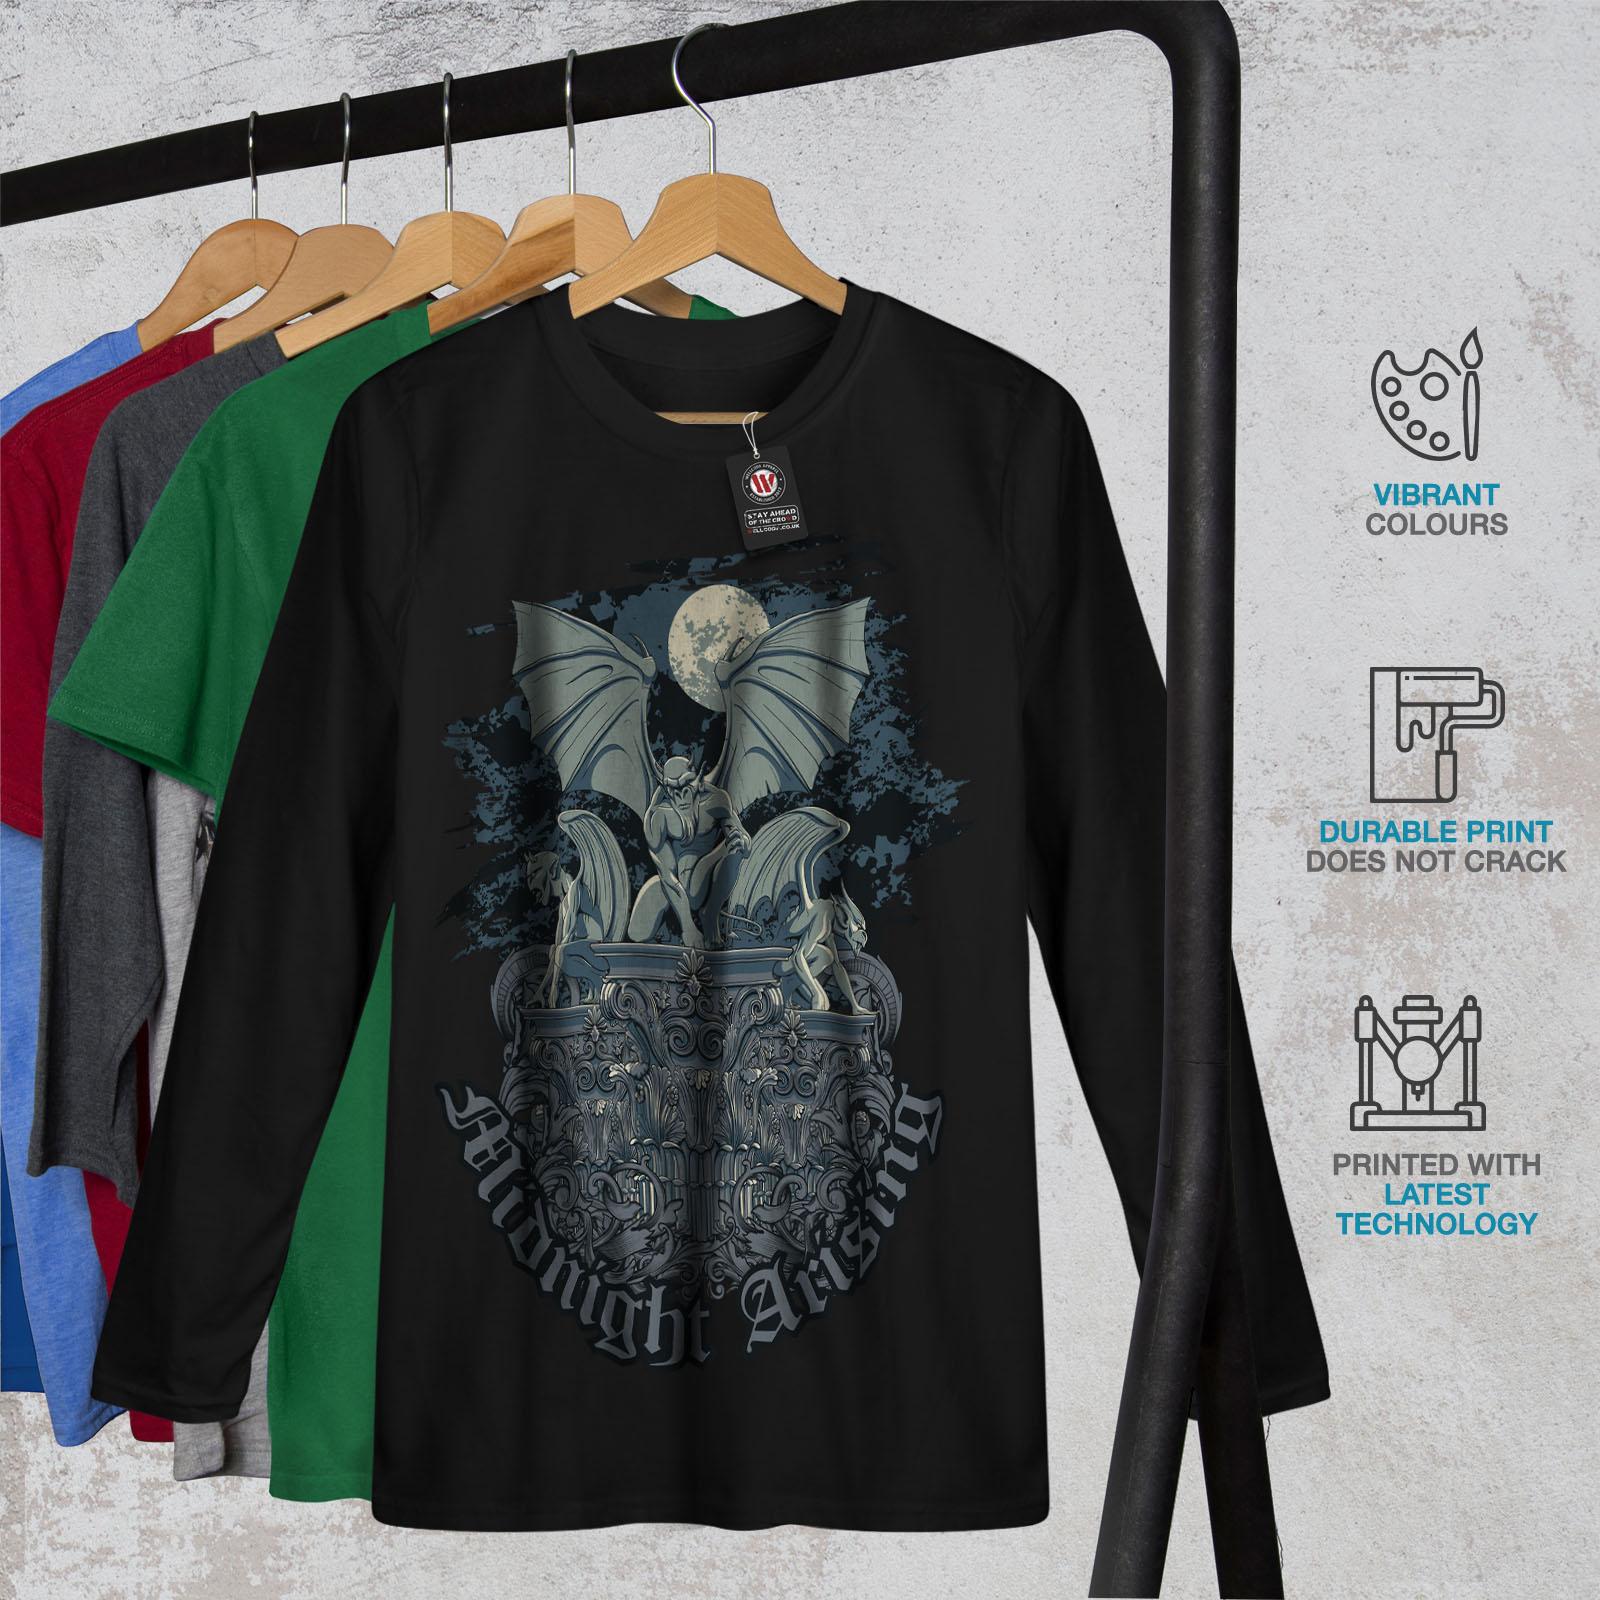 Gargoyle Graphic Design Printed Tee Wellcoda Midnight Demon Mens T-shirt